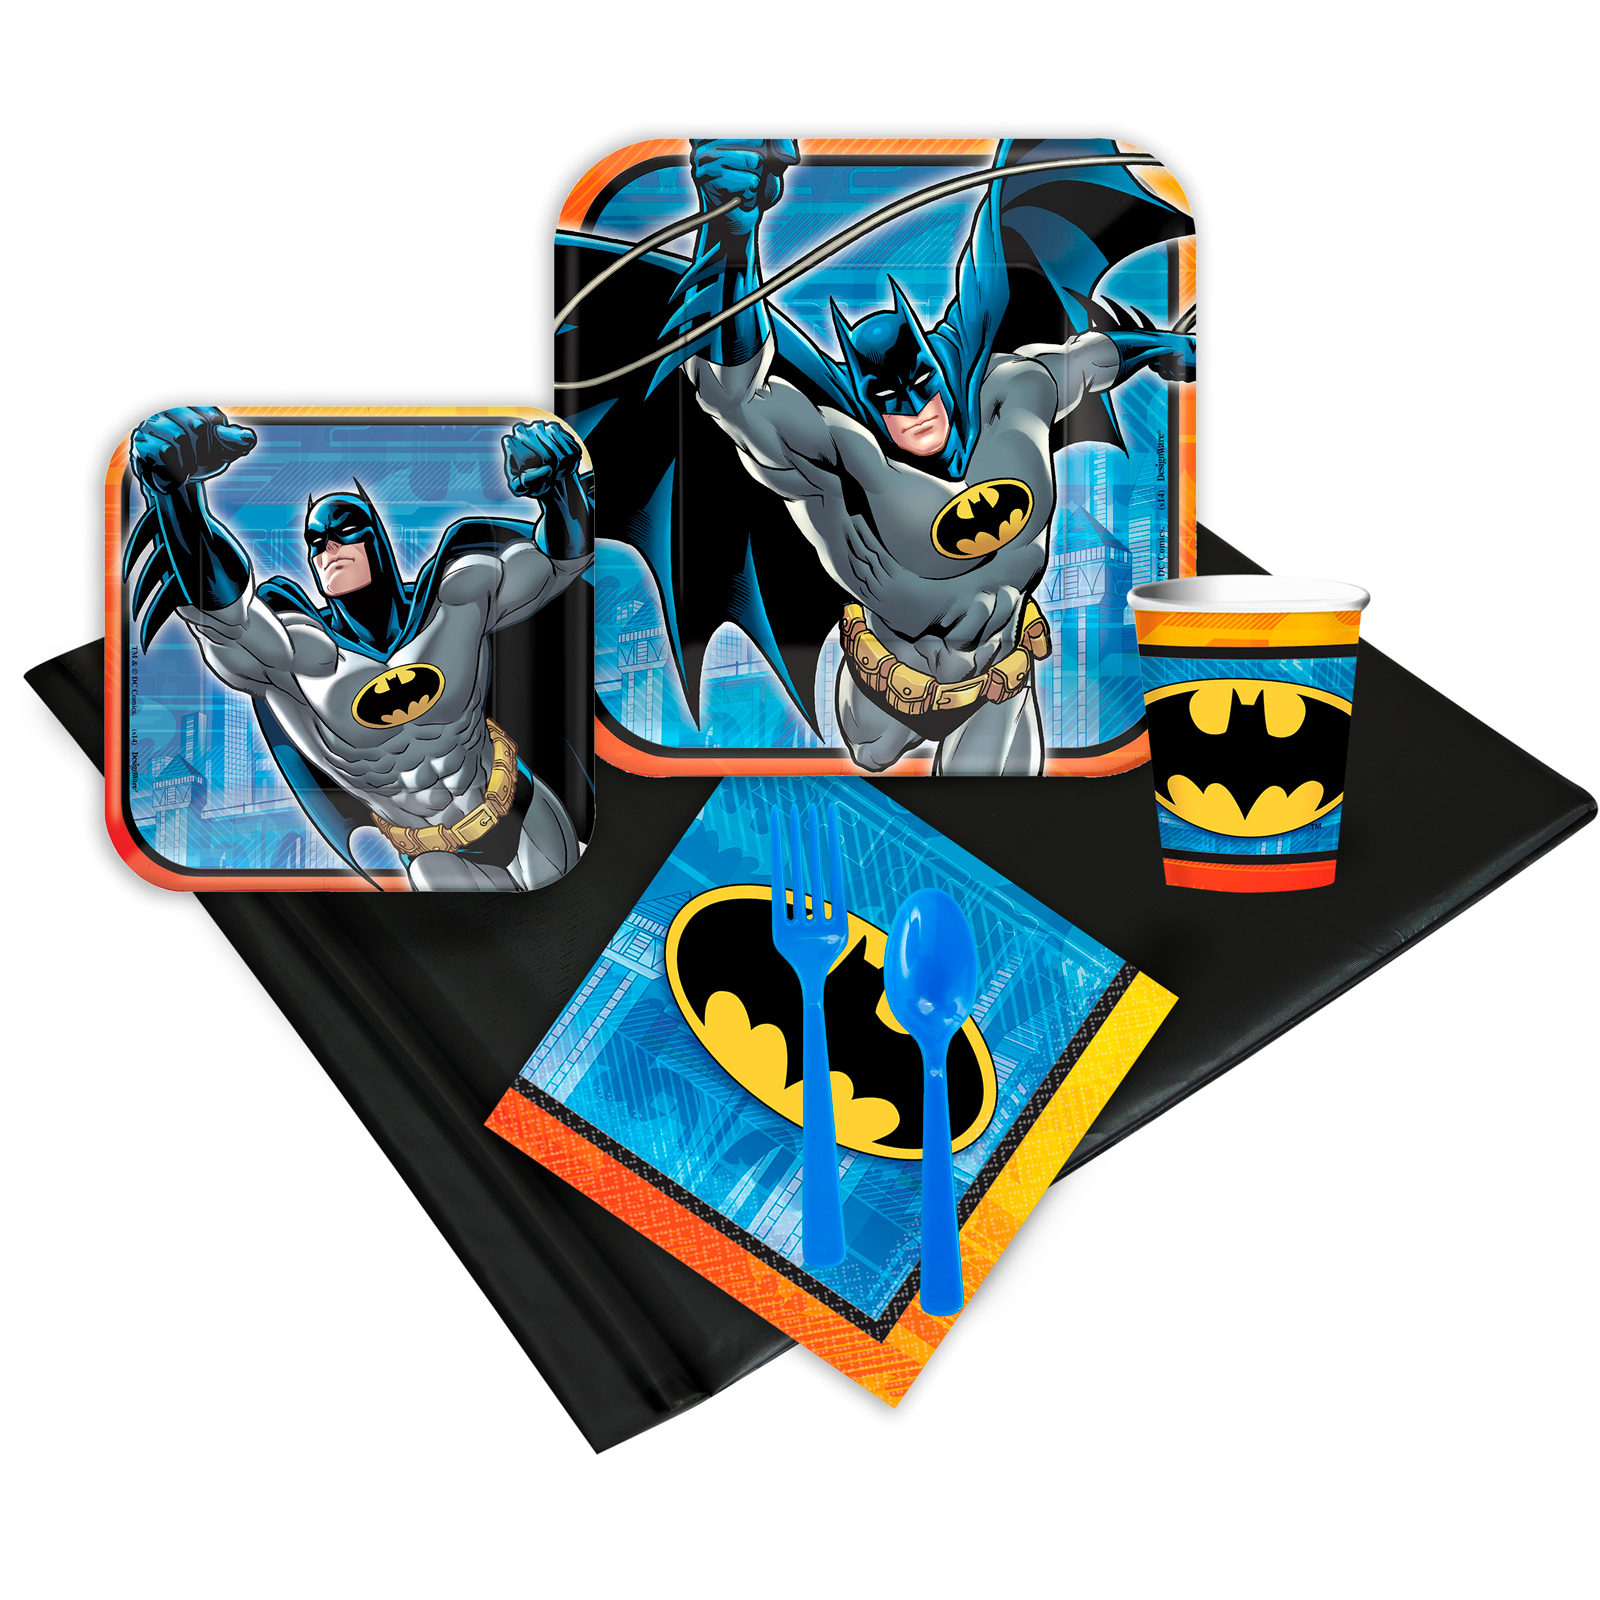 Batman Deluxe Kit (Serves 8) - Party Supplies